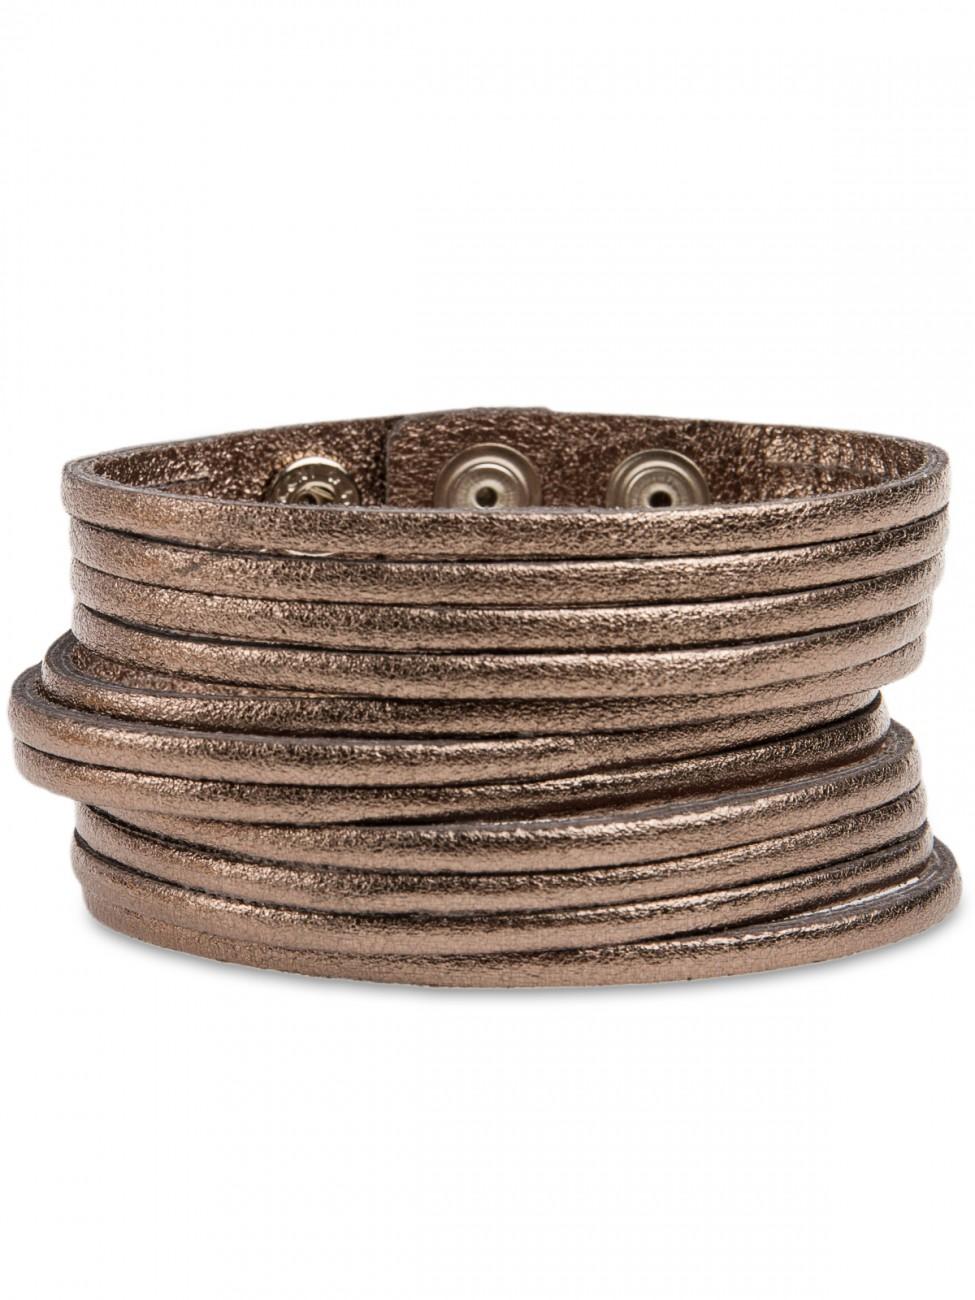 caspar damen lederarmband leder armband breit schwarz braun silber gold grau ebay. Black Bedroom Furniture Sets. Home Design Ideas